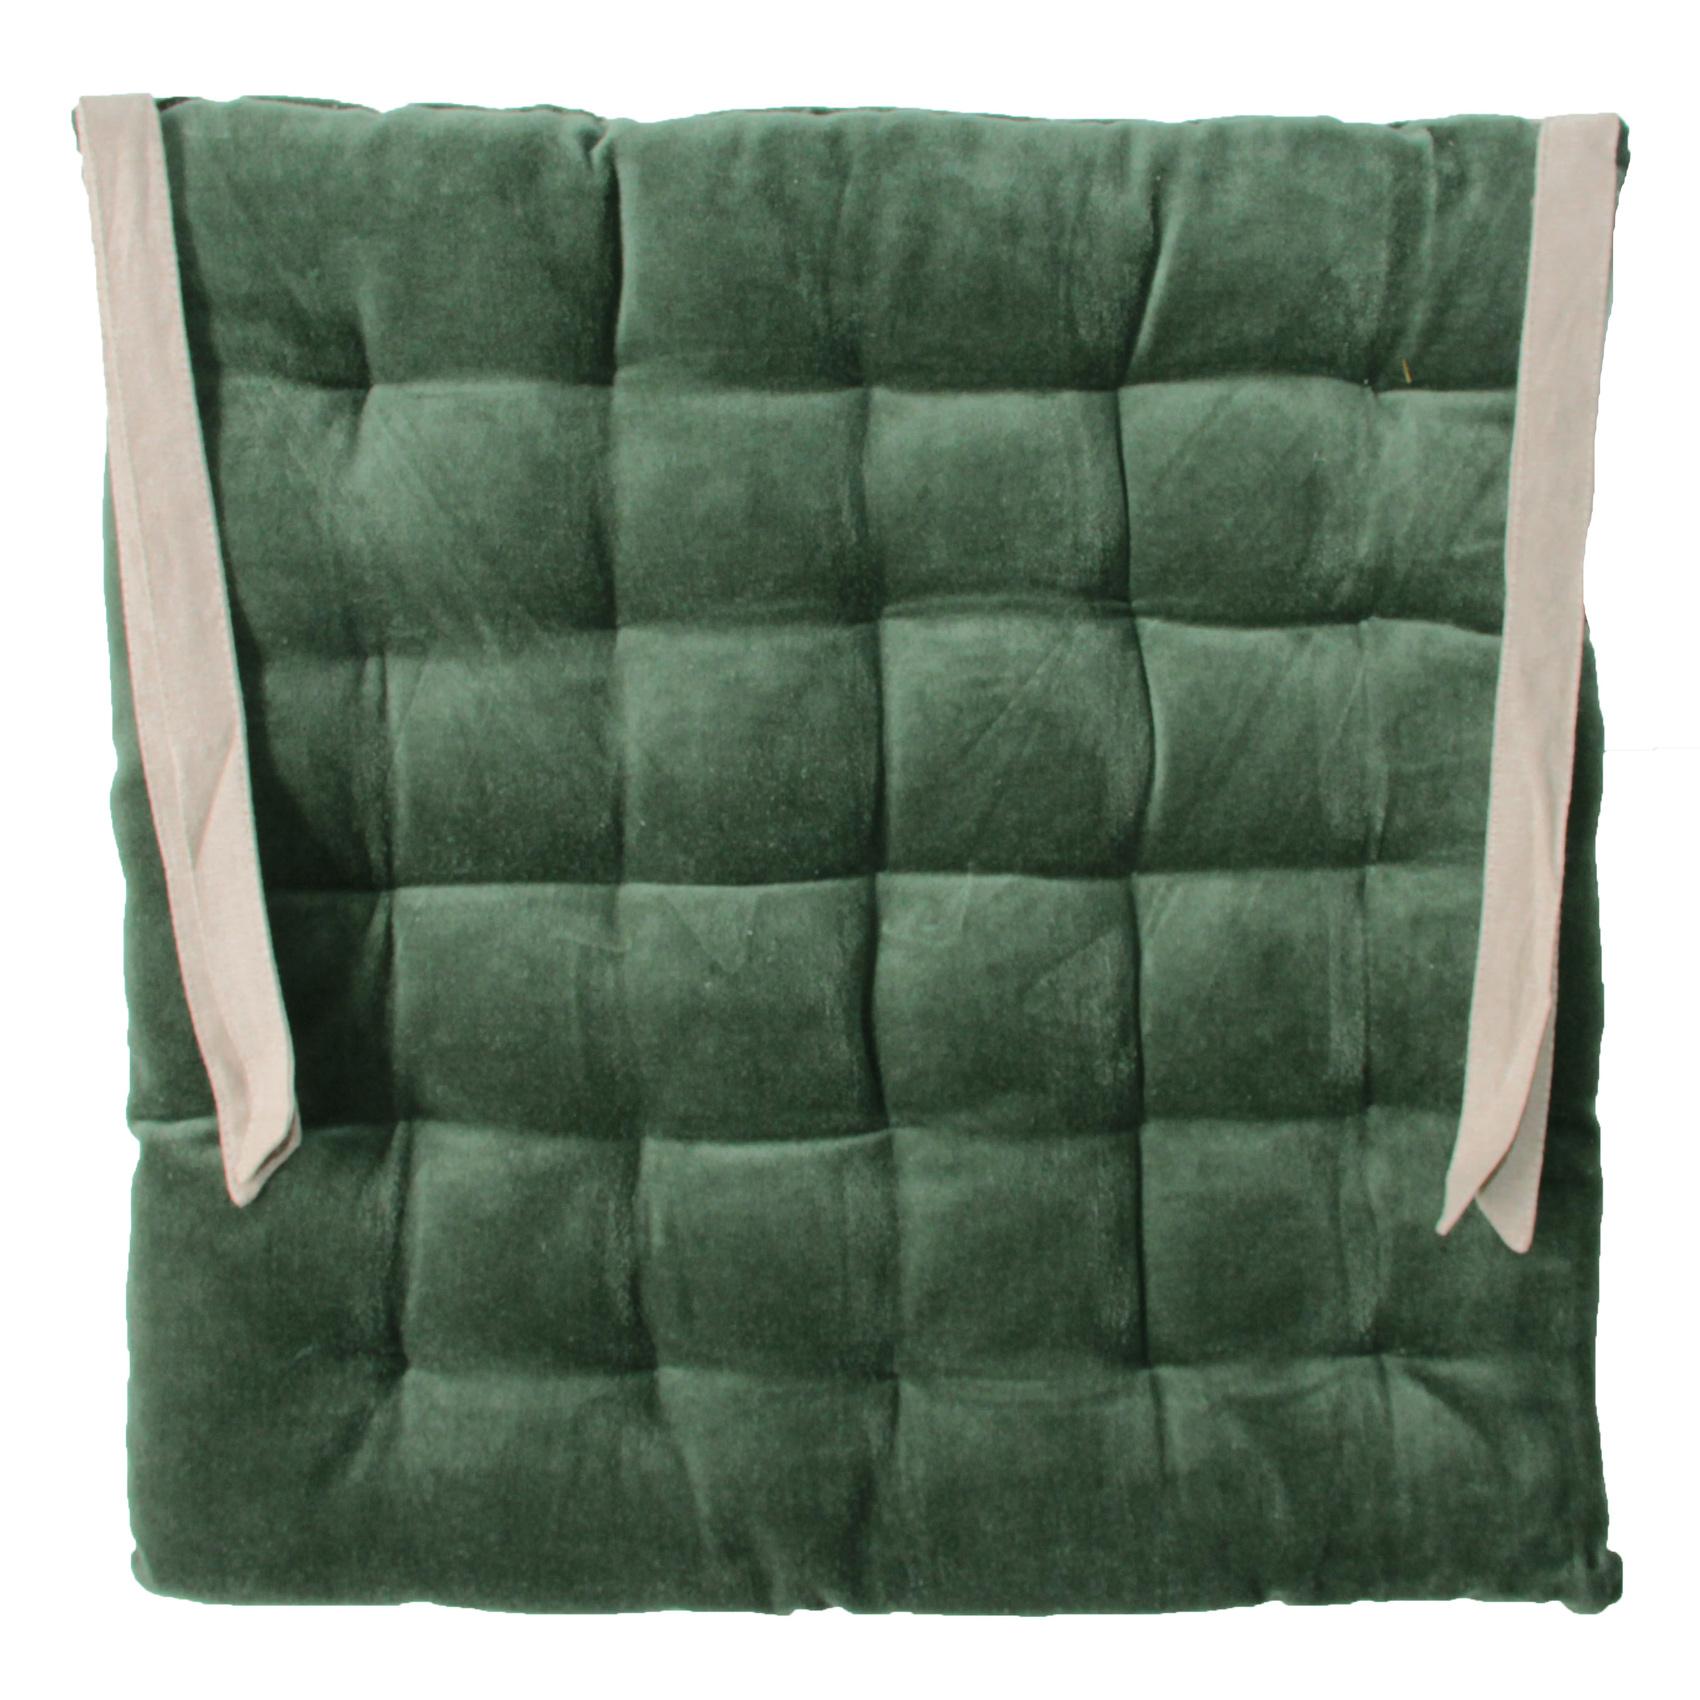 Galette de chaise en velours vert 40x40